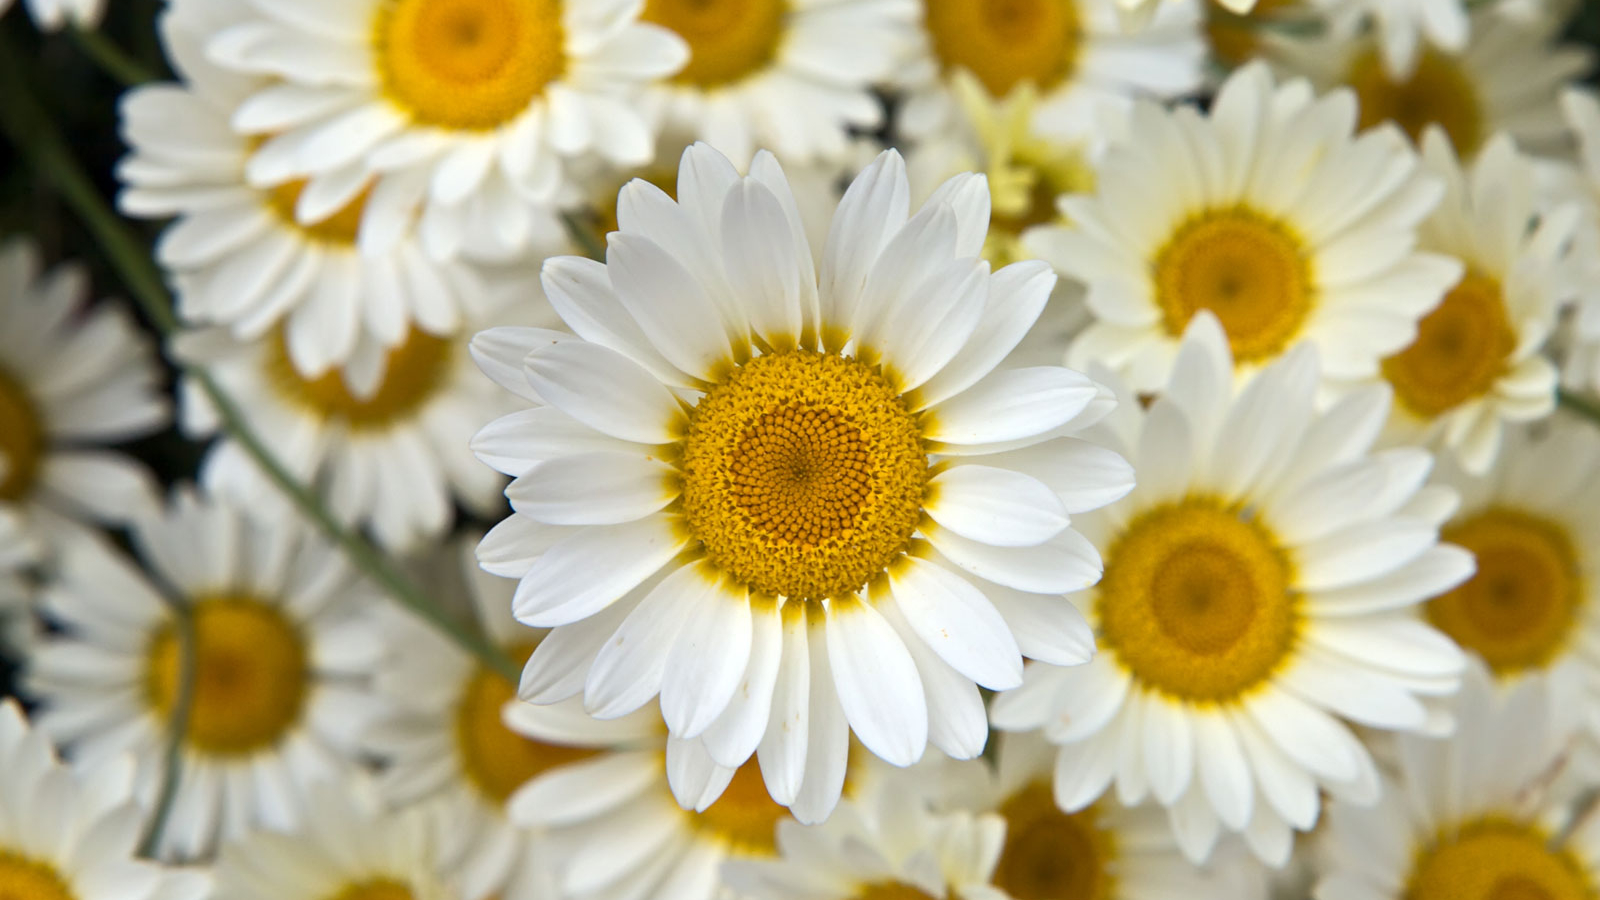 Flower Background Tumblr Wallpaper Hd Desktop 1600x1200 Download Resolutions 1600x900